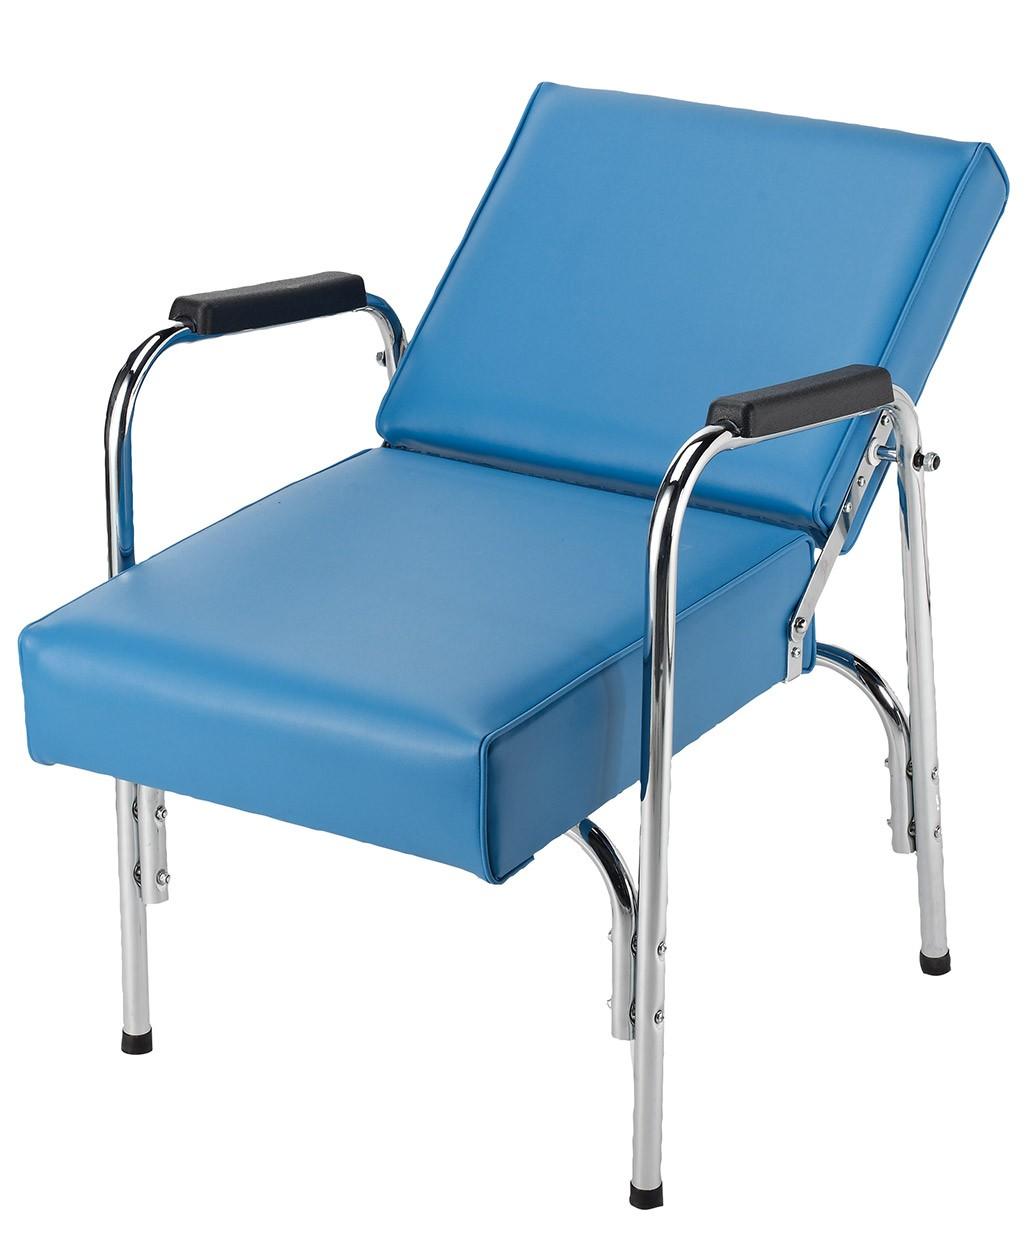 Pleasant Salon Shampoo Chairs Reclining Electric Hair Wash Chairs Download Free Architecture Designs Rallybritishbridgeorg